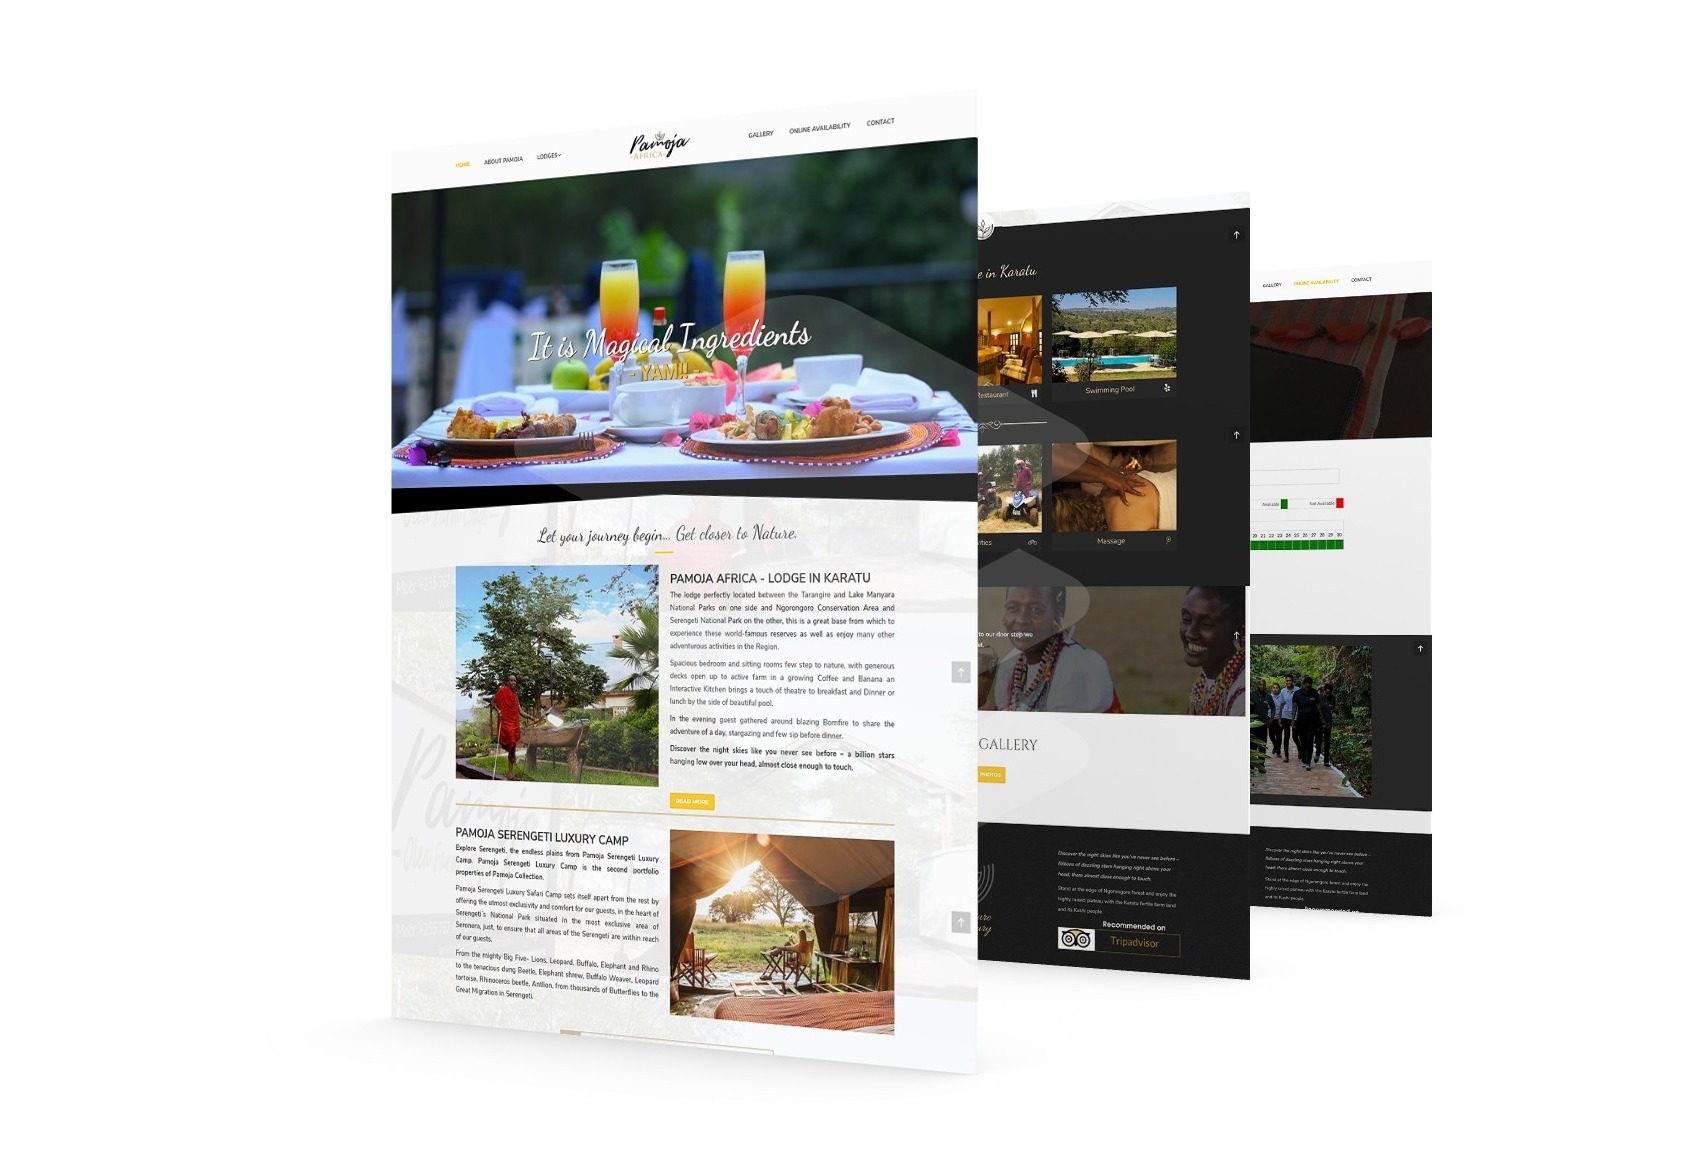 website design in Arusha